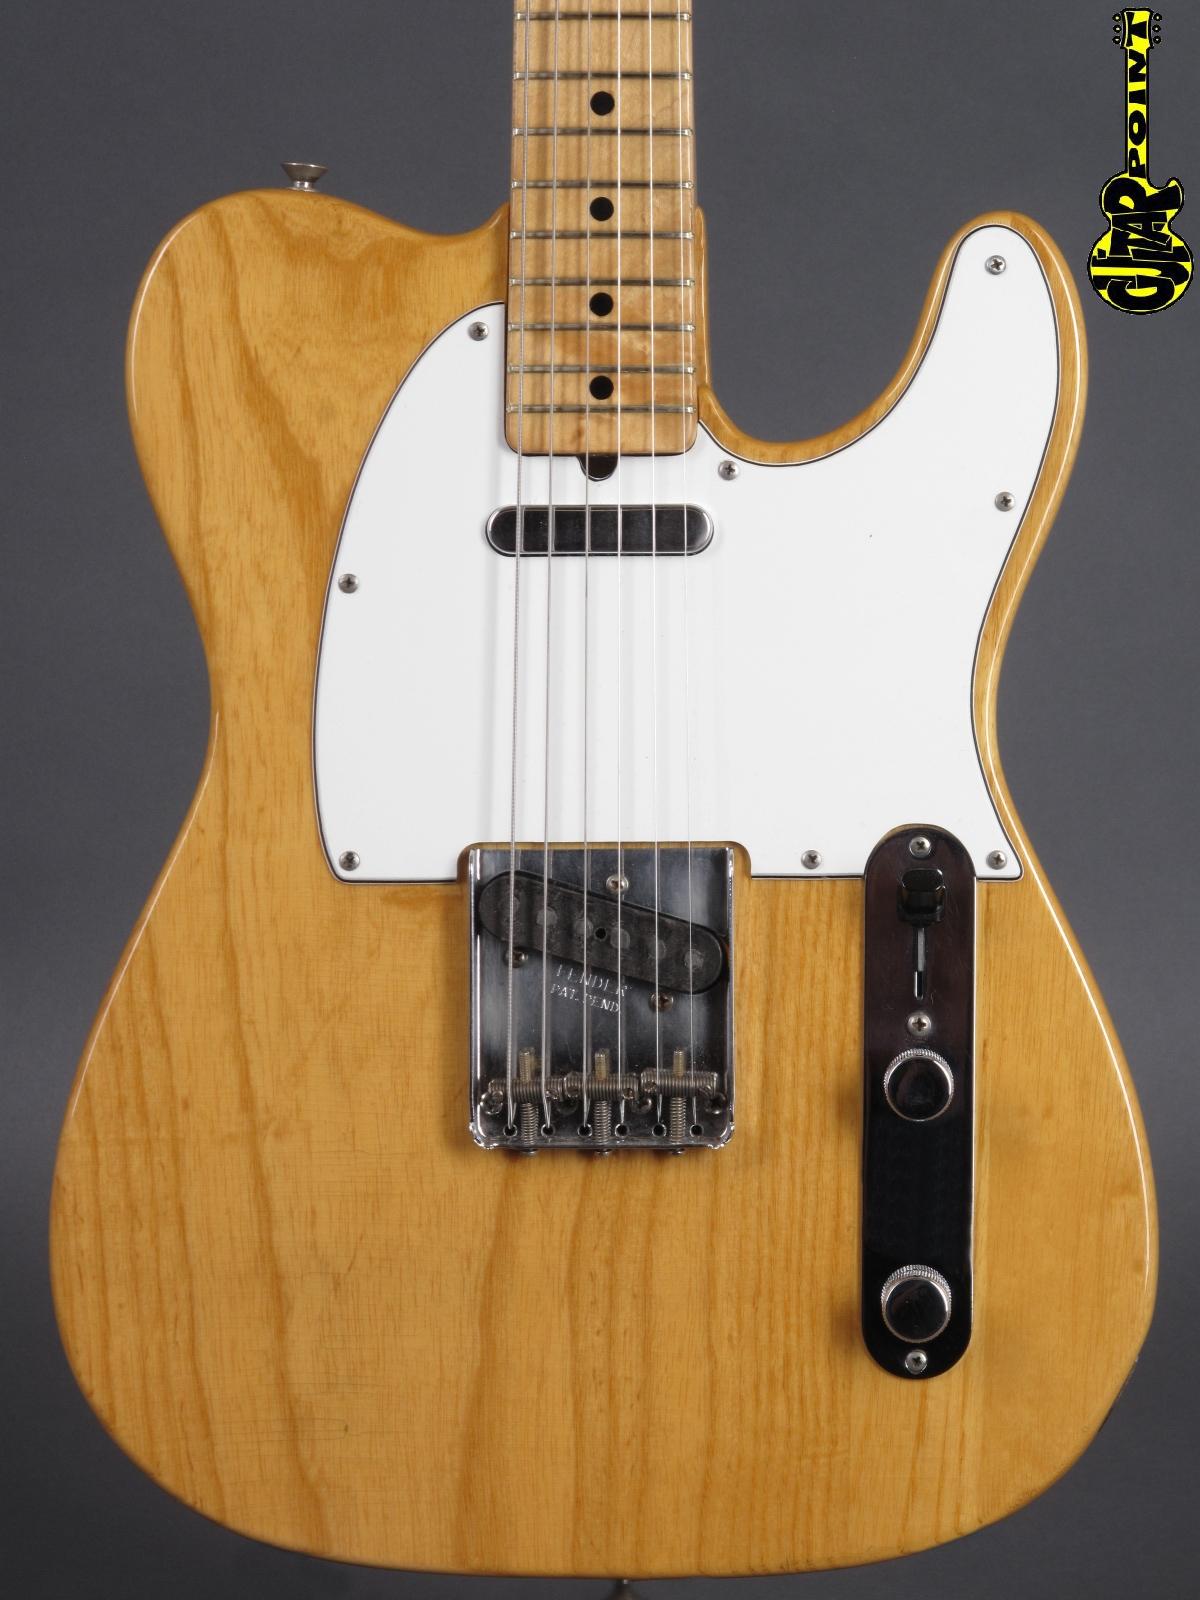 1973 Fender Telecaster - Natural